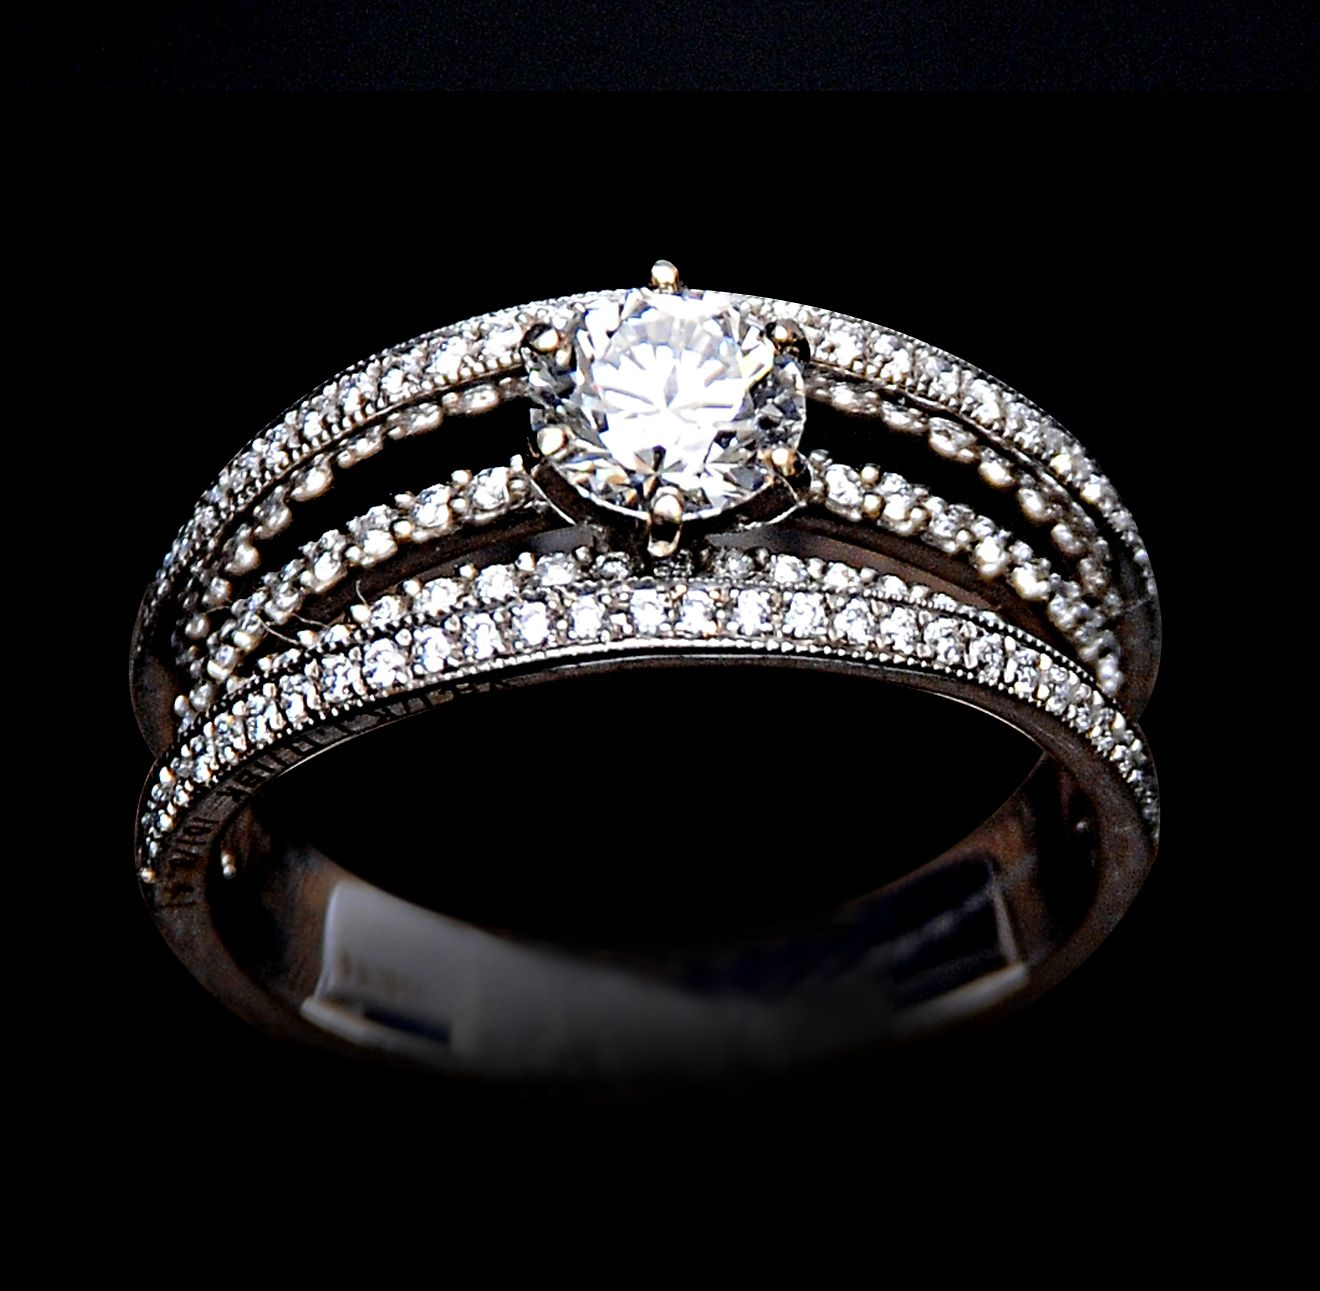 buy wedding rings wholesale diamond jewelry Buy high quality wholesale diamonds and fine jewelry online